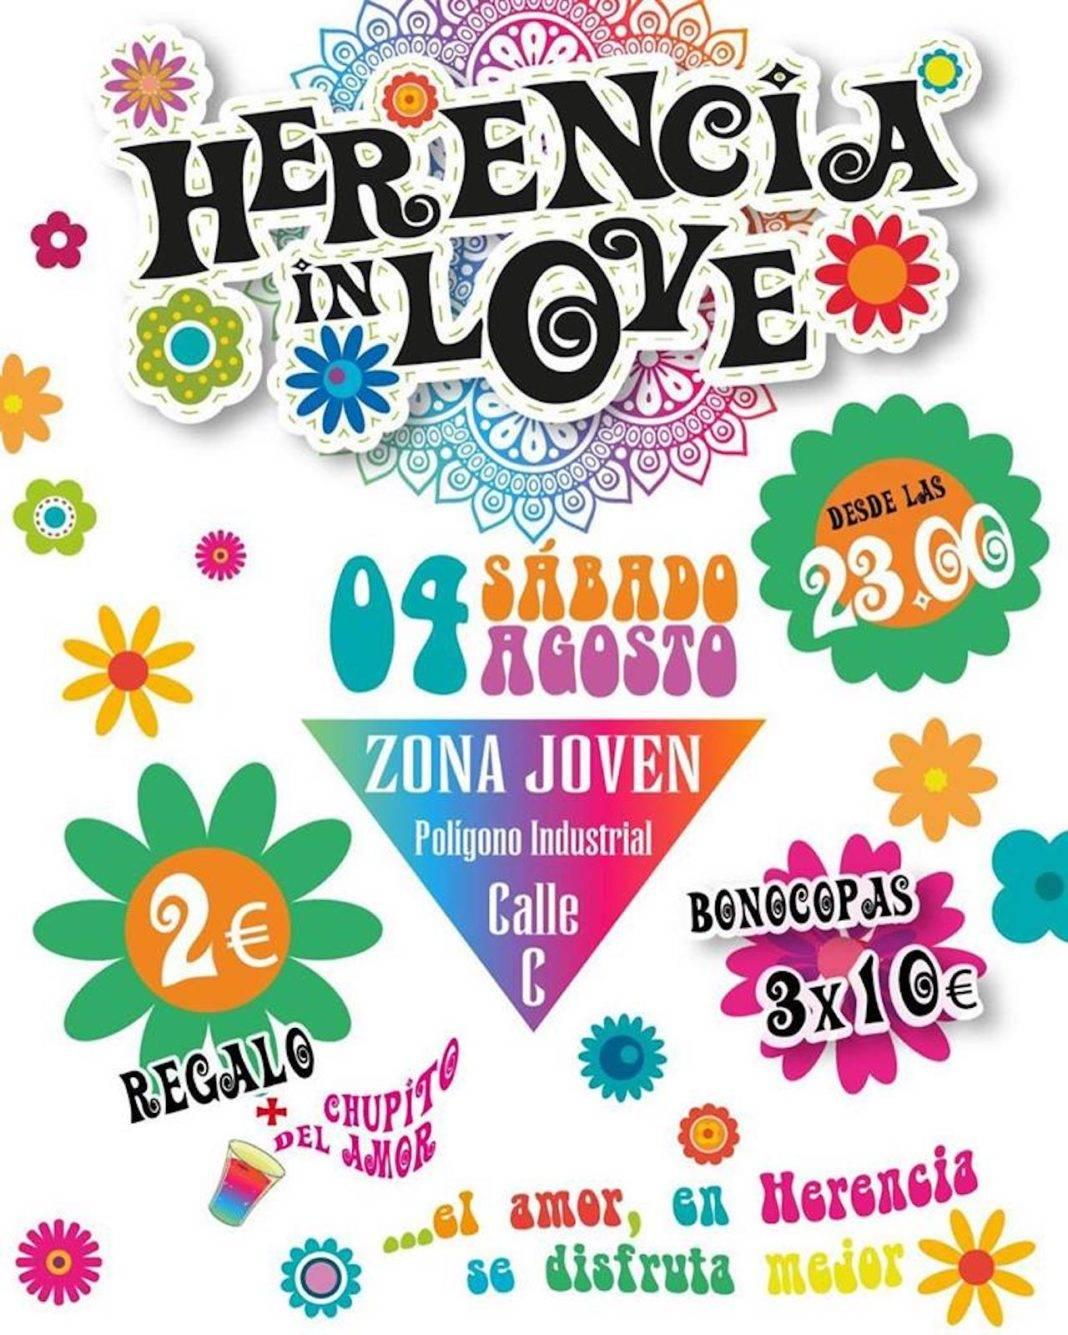 "fiesta botellon herencia in love 1068x1335 - Fiesta ""Herencia in love"" este fin de semana en Herencia"